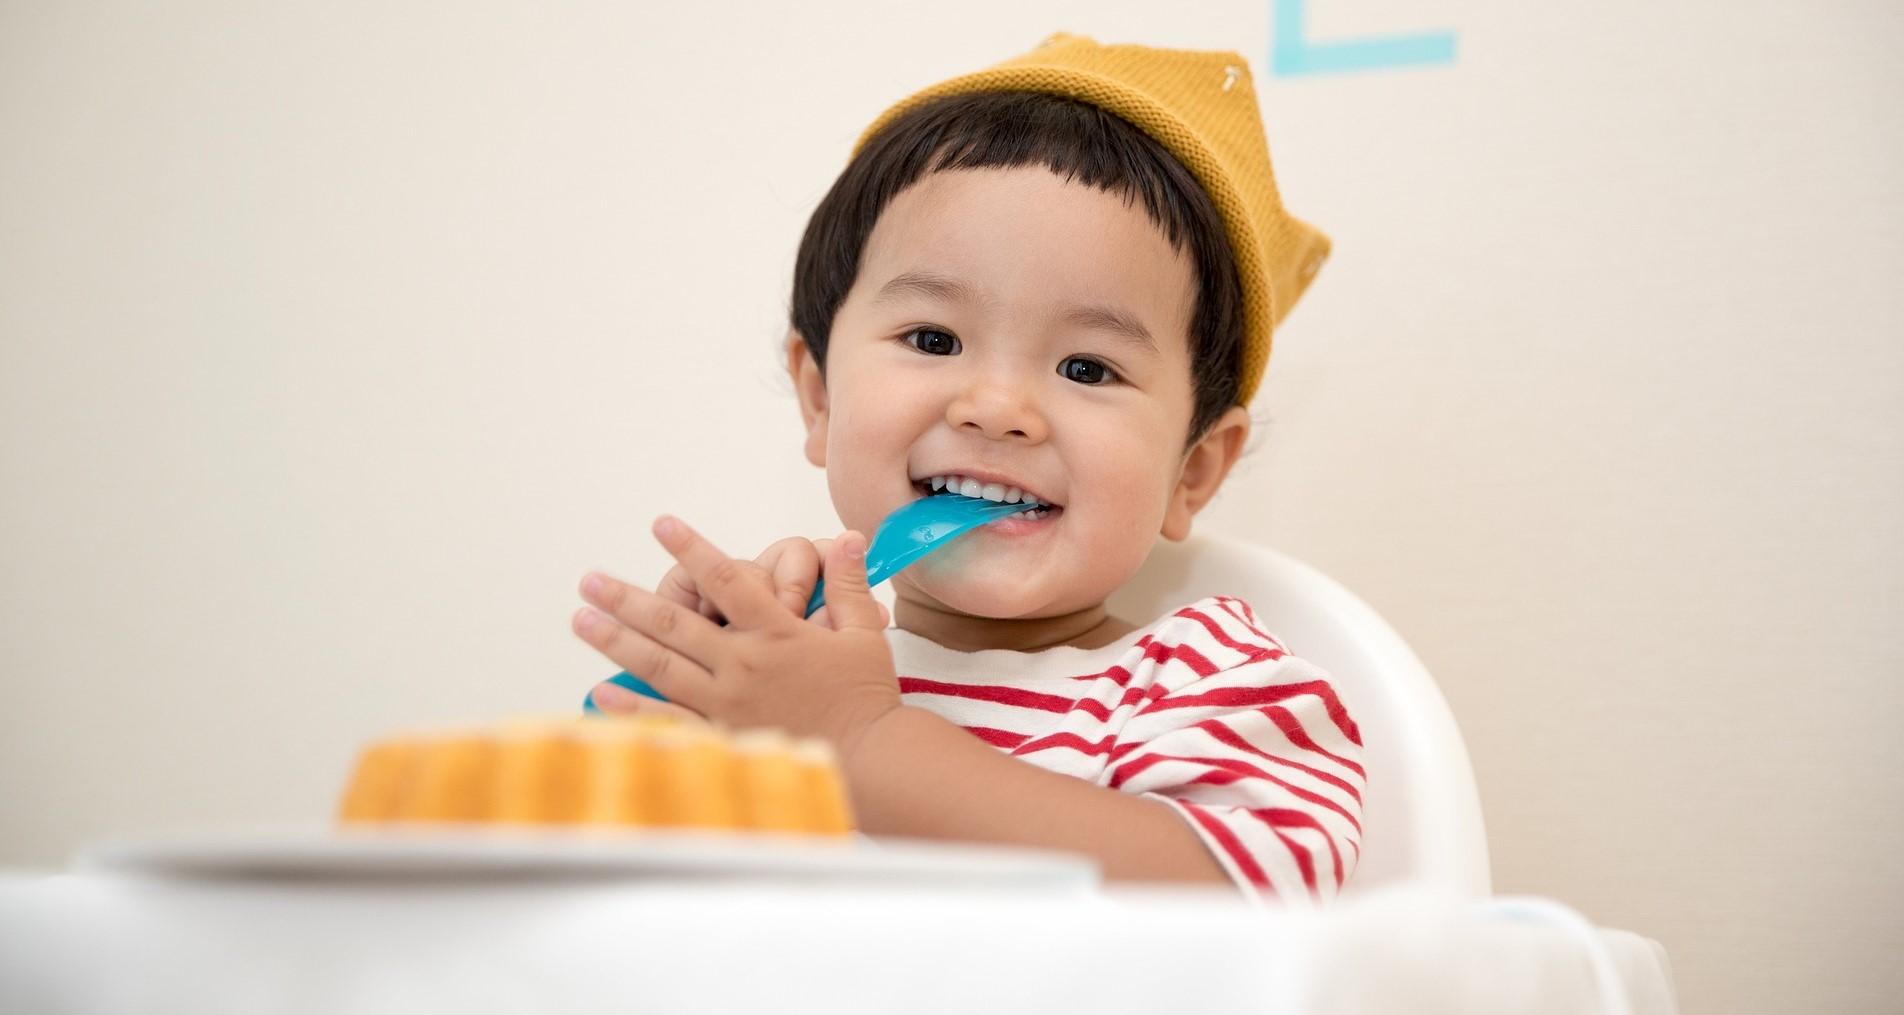 Happy Kid Eating Breakfast | Kids Car Donations